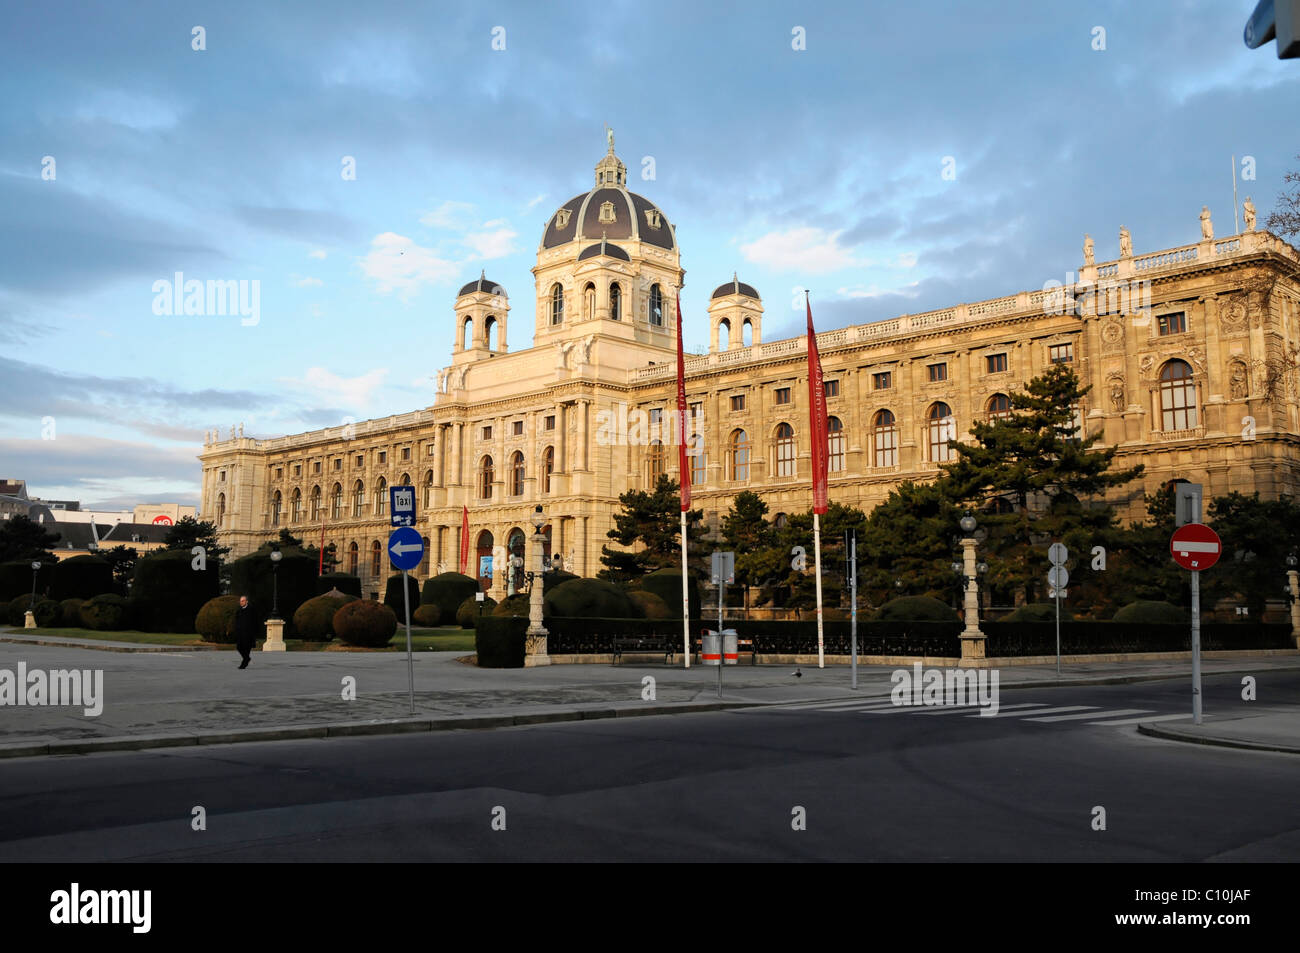 Kunsthistorisches Museum, Museum of Art History, Ringstrasse, Vienna, Austria, Europe Stock Photo